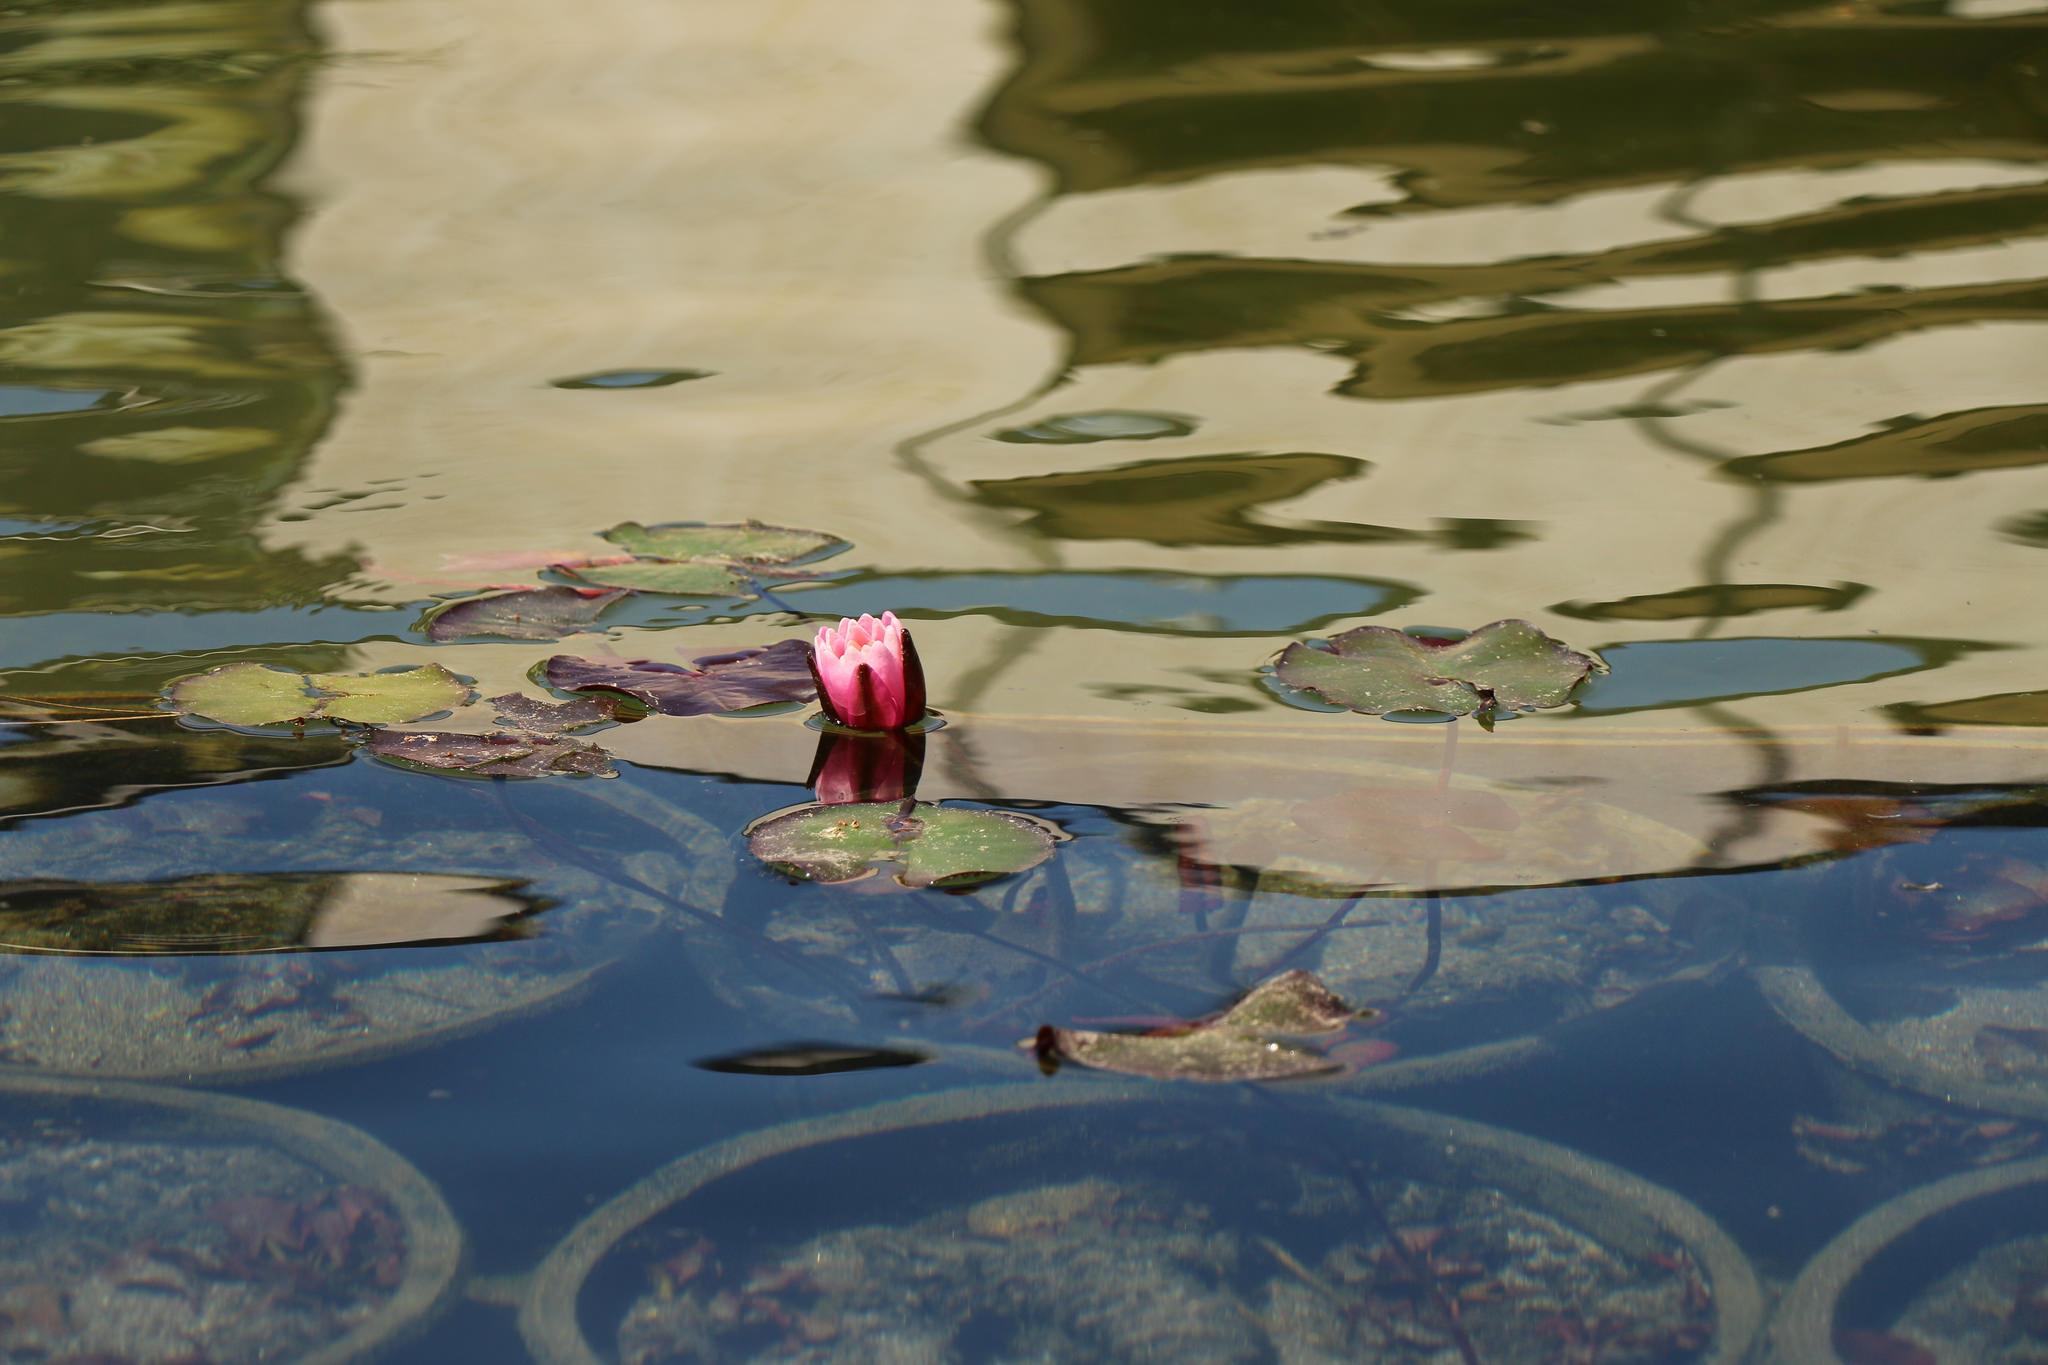 Blooming Balboa Park_18540152616_l.jpg